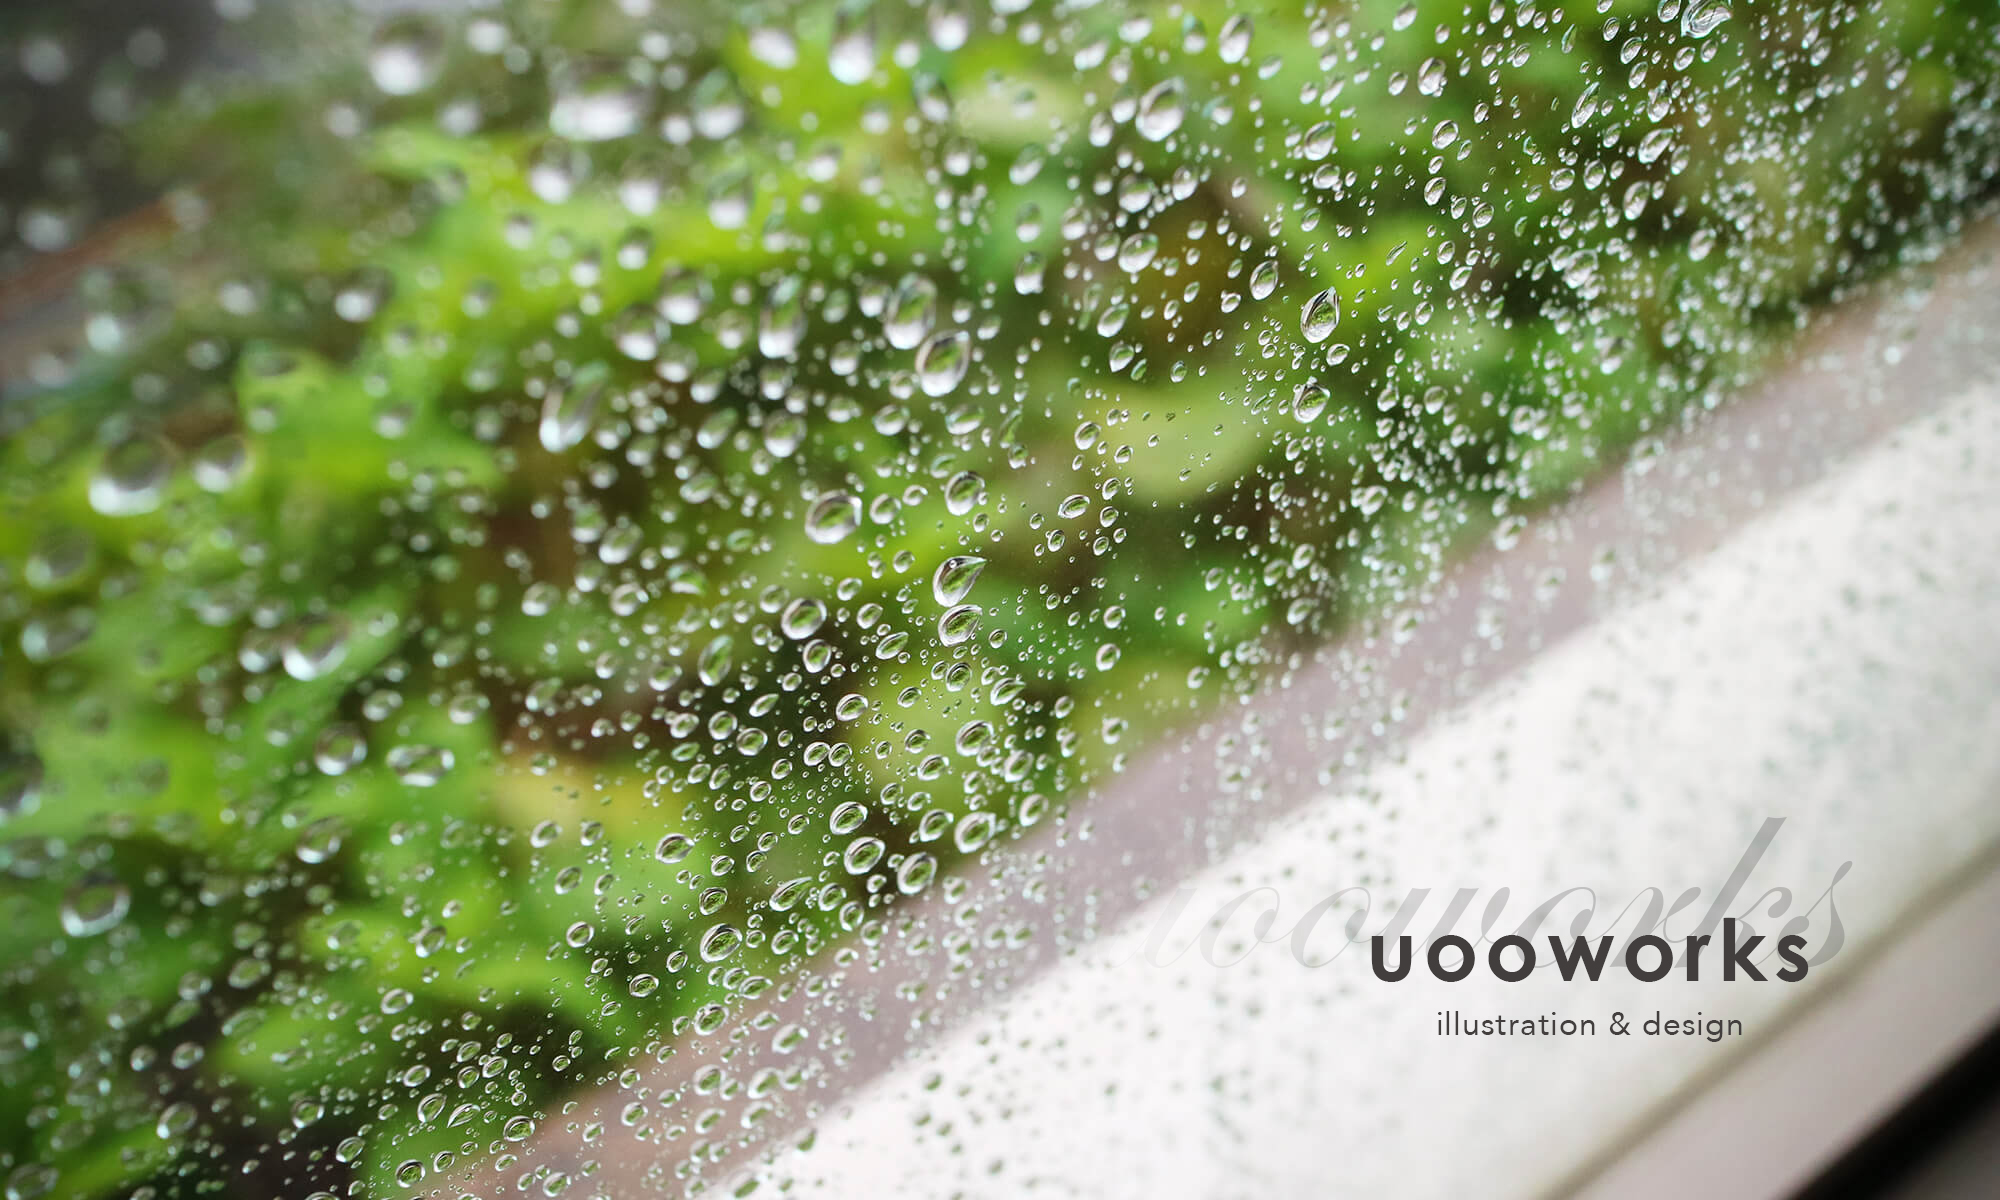 uooworksイメージ画像